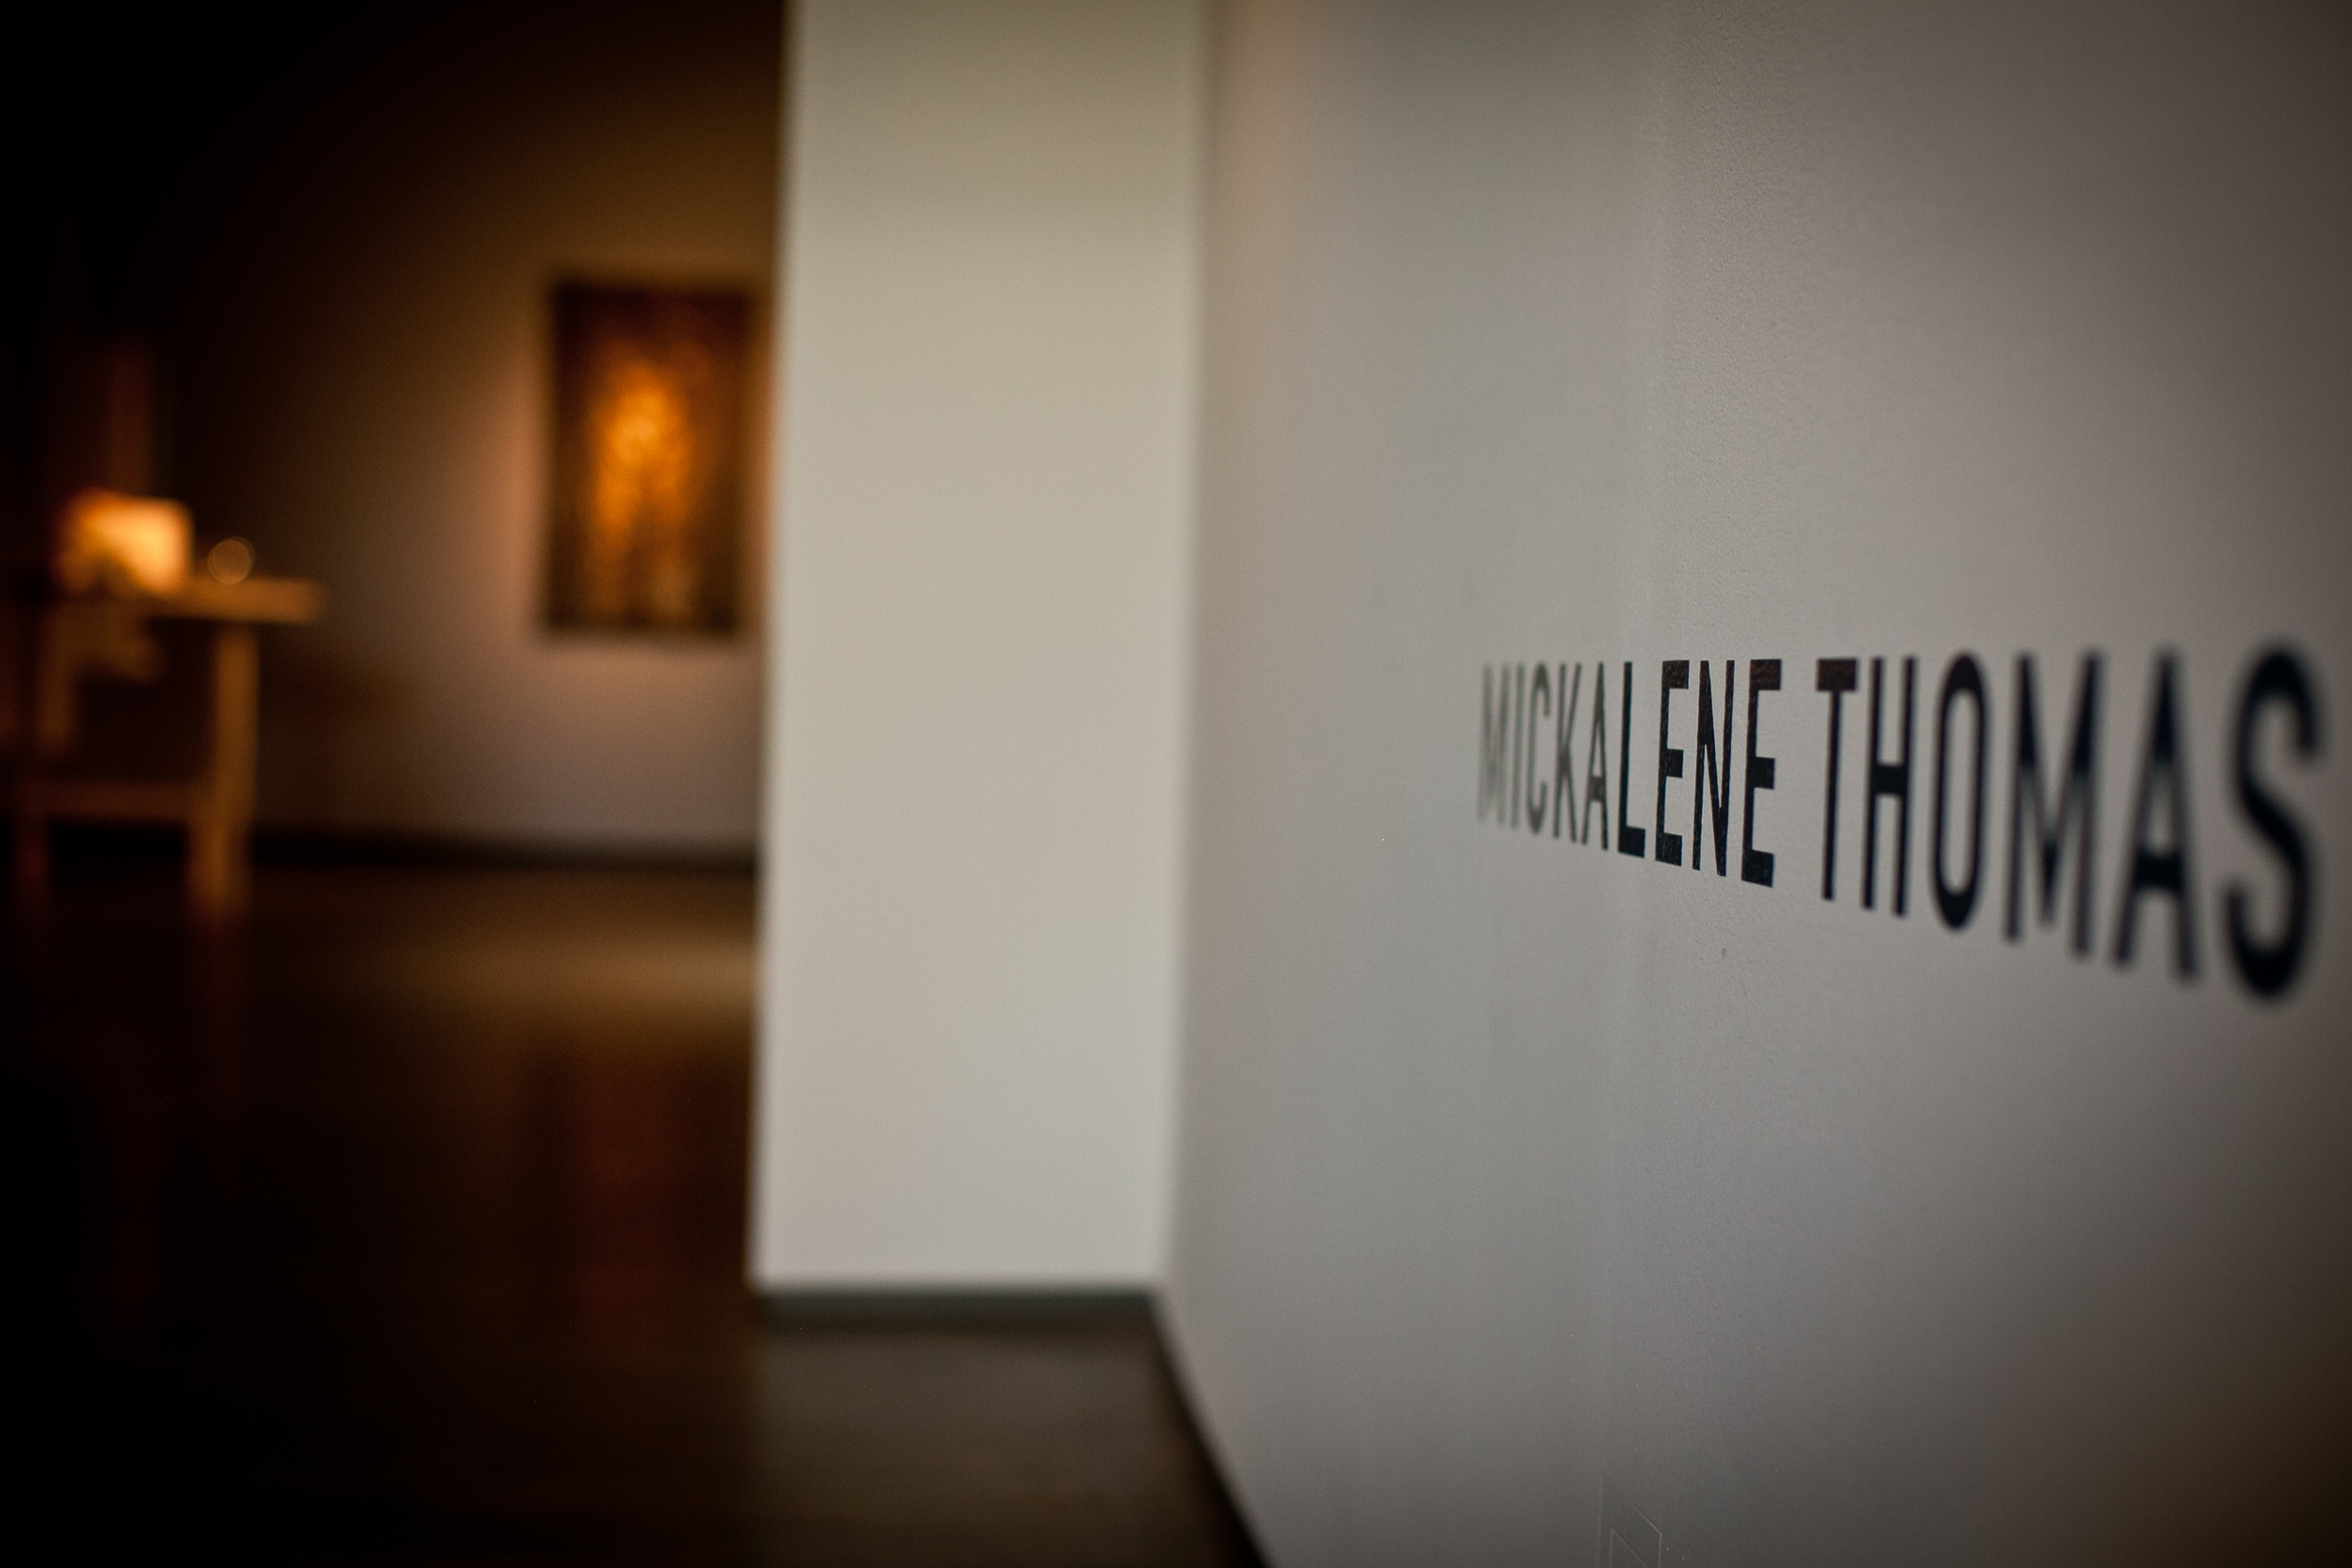 Kavi Gupta West Loop Expo Chicago Mickalene Thomas Glenn Kaino modern art sculpture chicago-0004.jpg